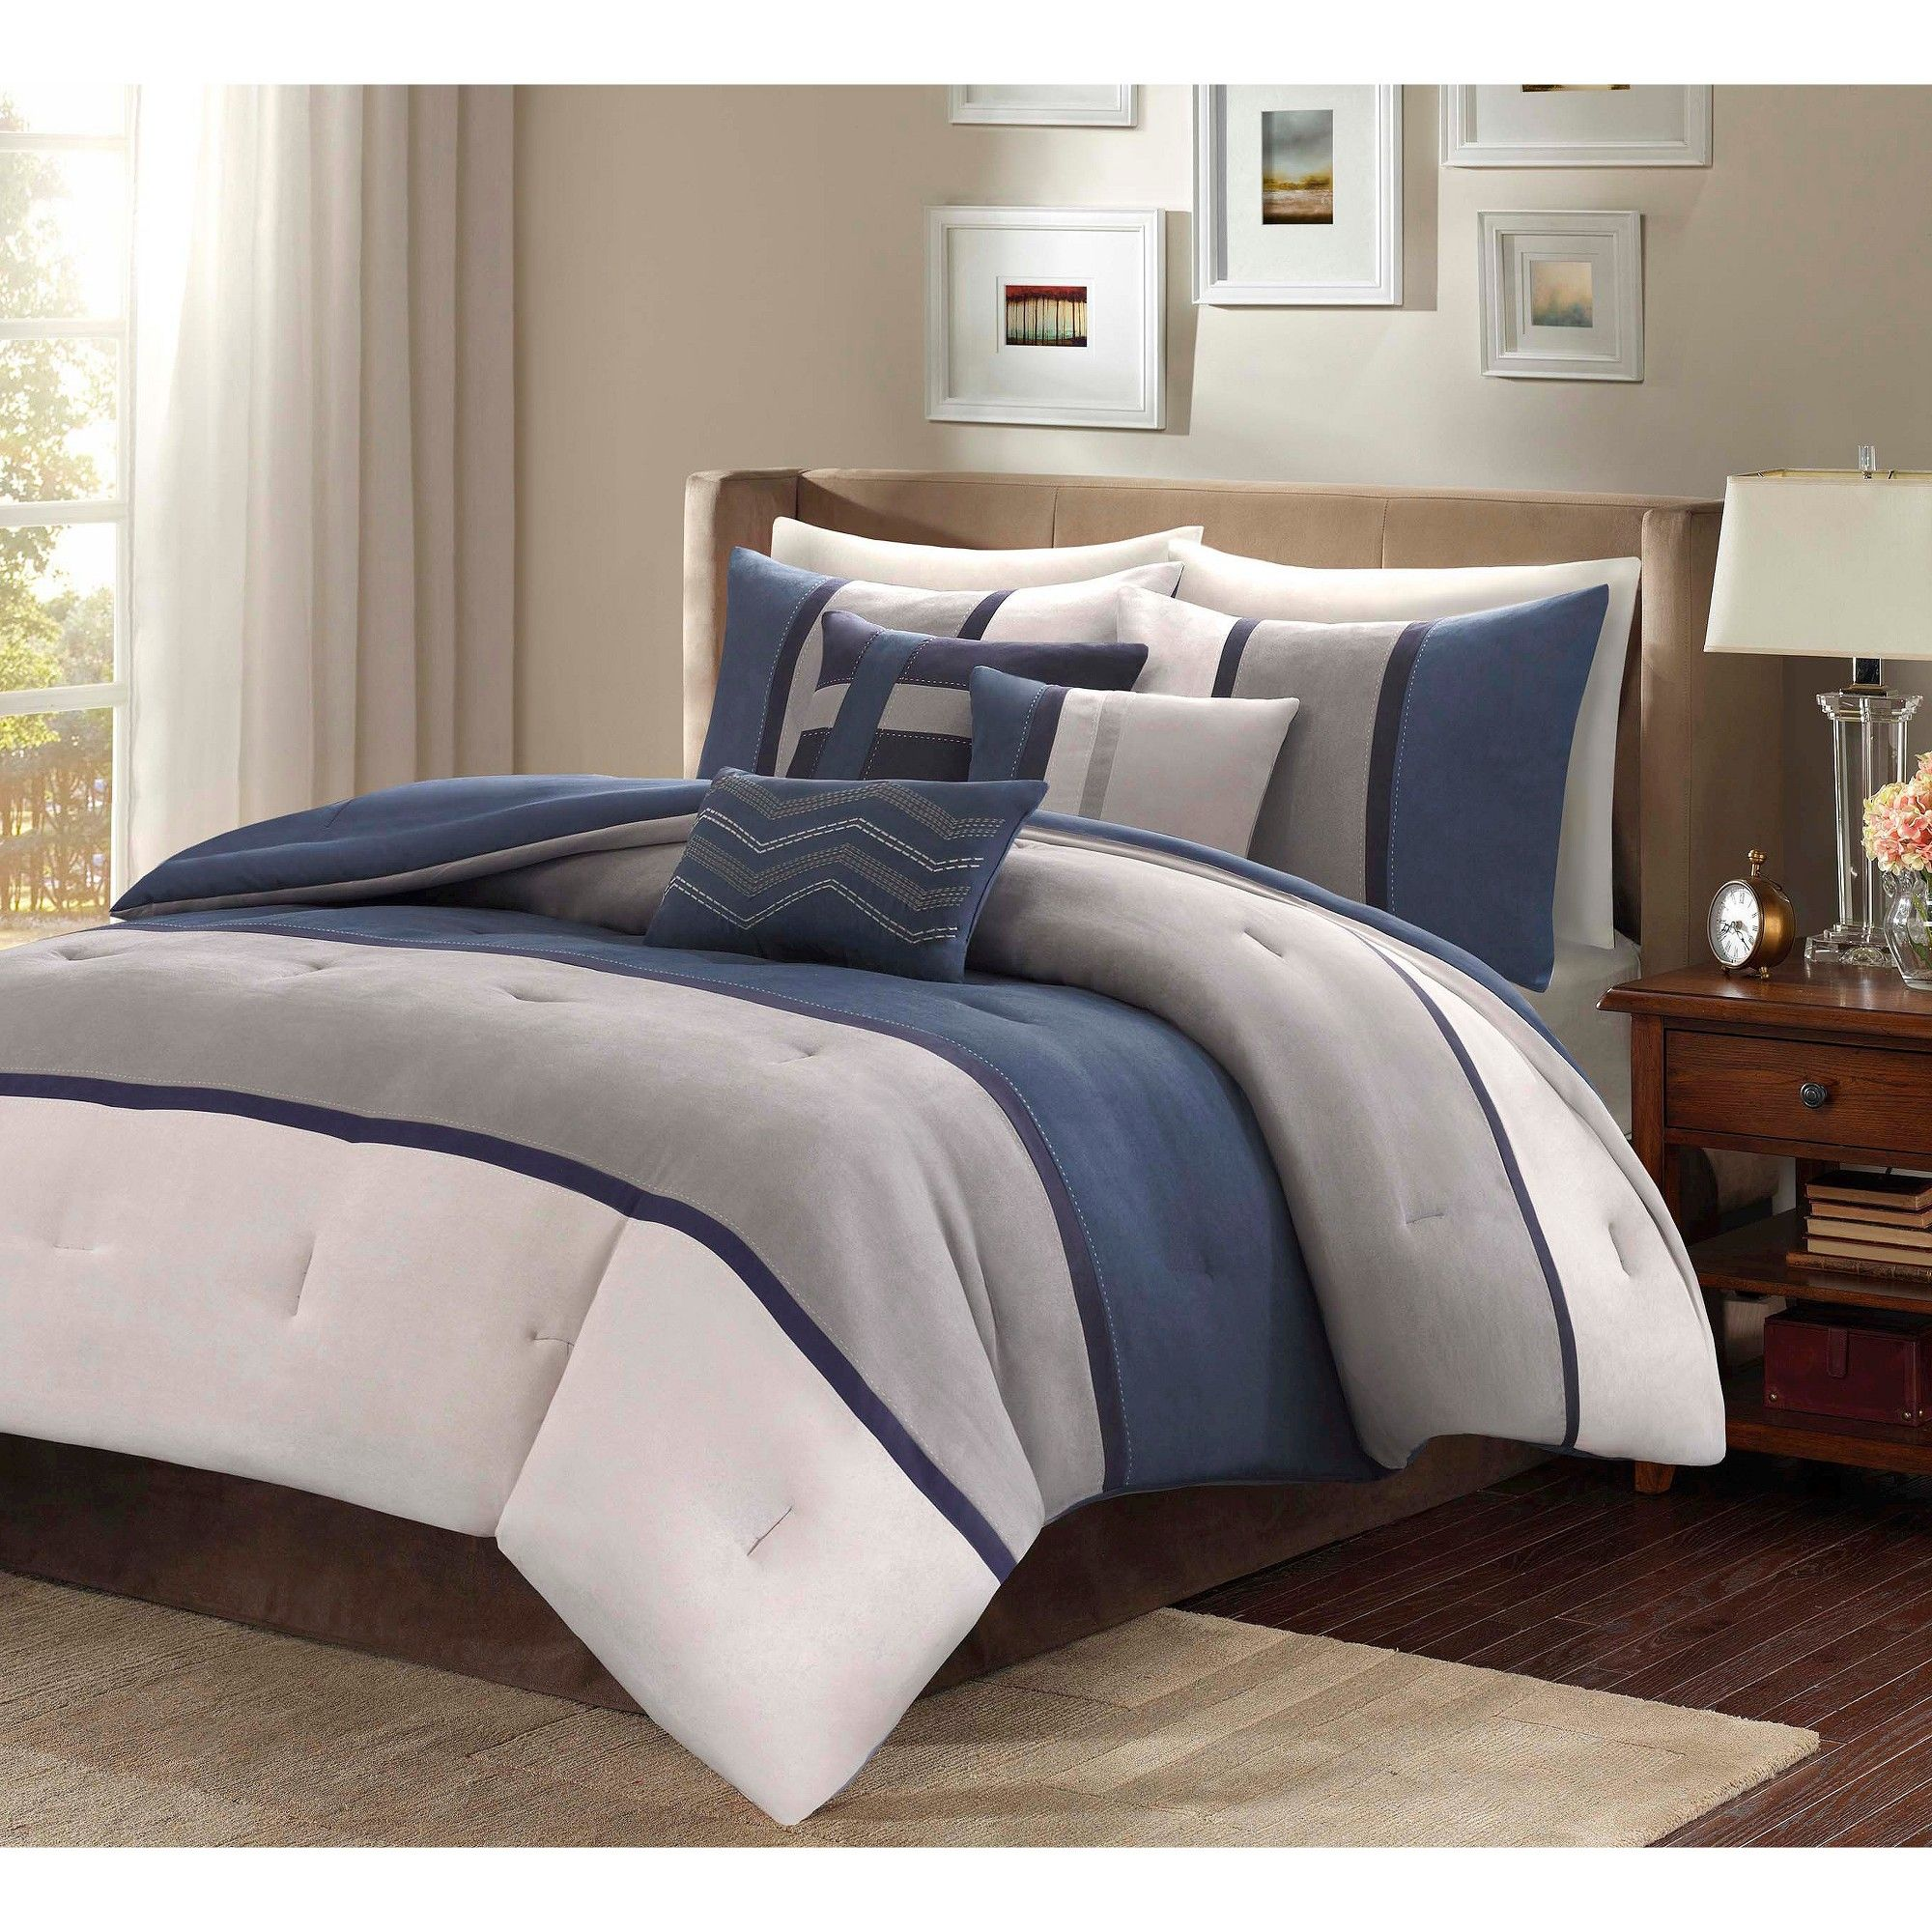 Blue Overland Microsuede Comforter Set California King 7pc Homa